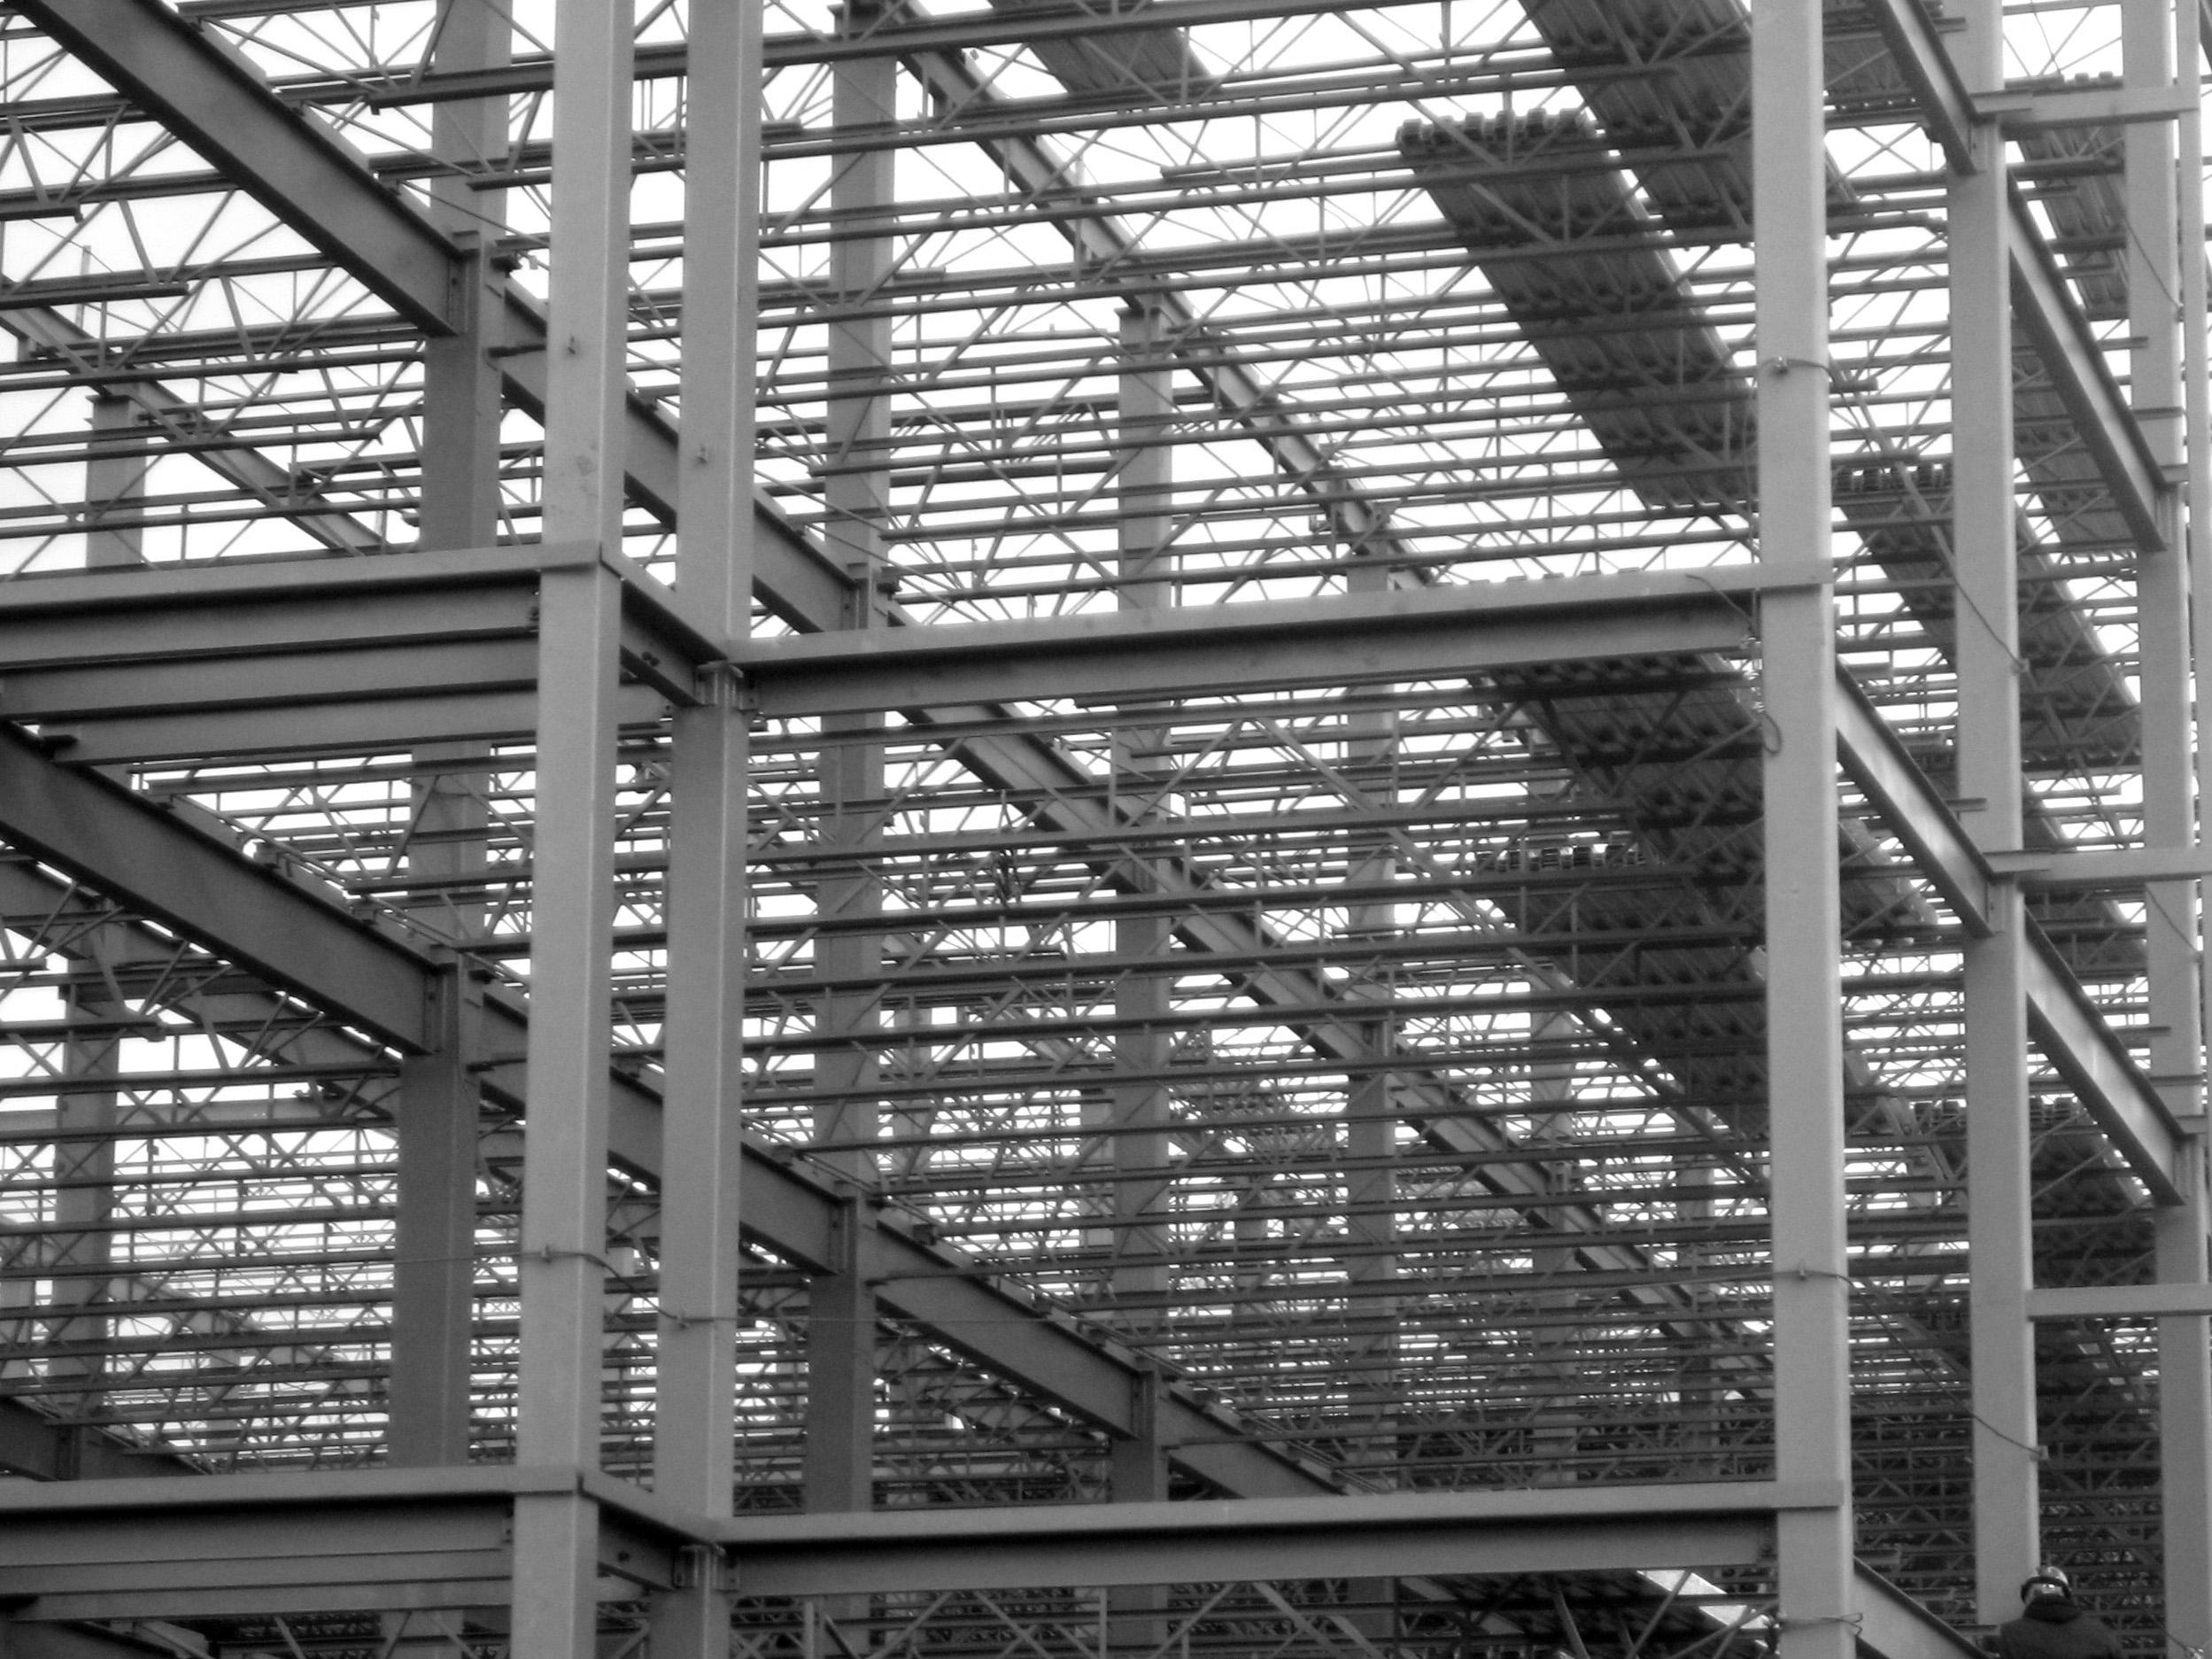 Commercial l Retail l Industrial l Residential l Renovation l Design - Build